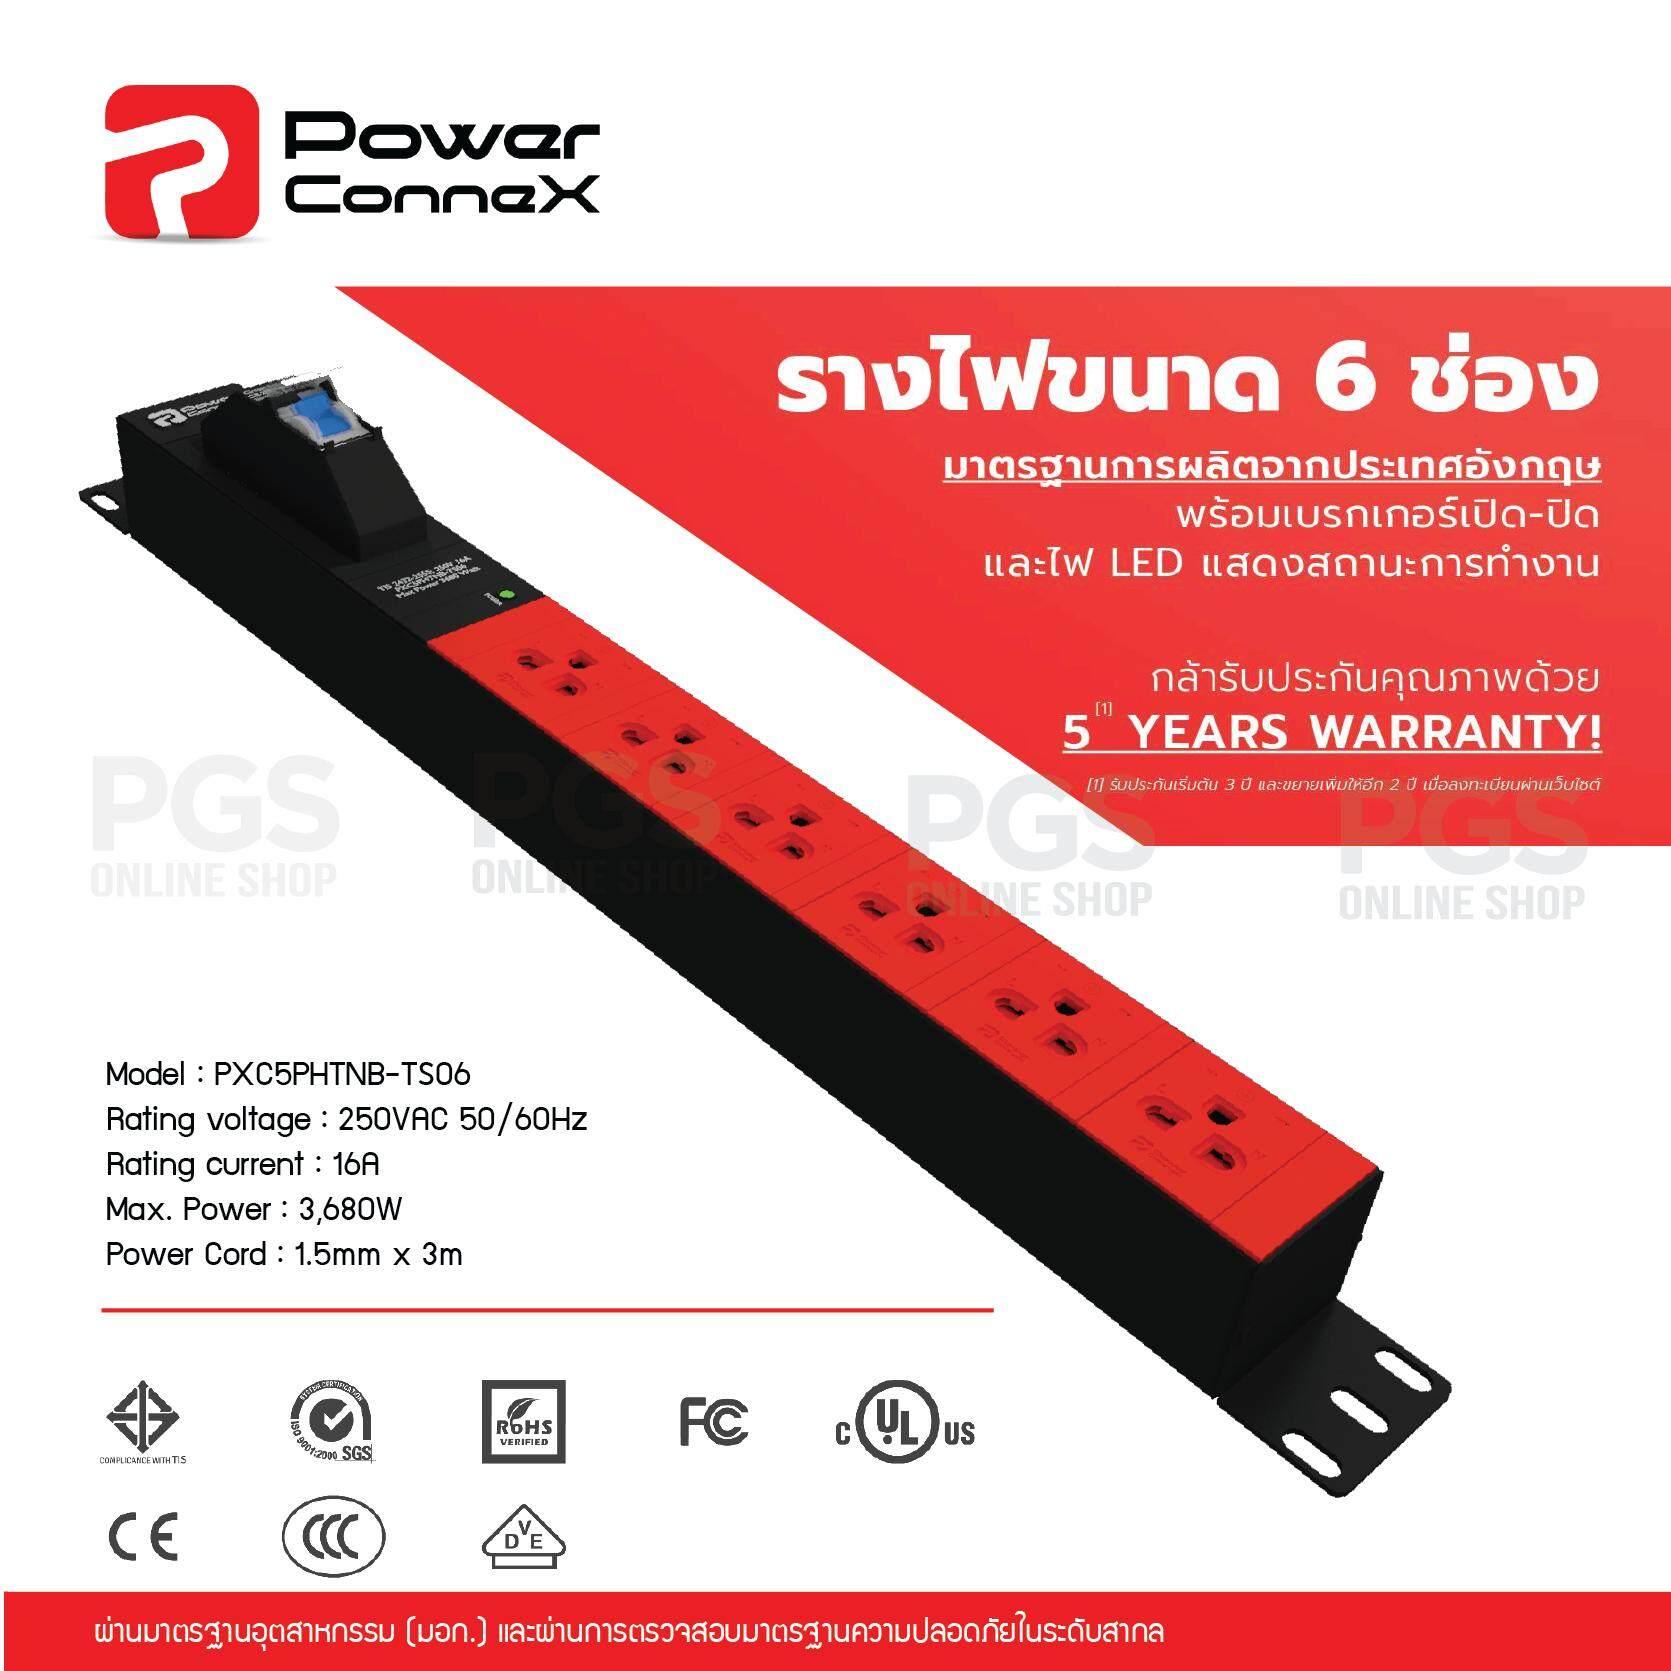 PowerConneX ปลั๊กไฟ (PXC5PHTNB-TS06) ขนาด 6 ช่อง พร้อม Breaker เปิด-ปิด มีระบบป้องกันกระแสไฟเกินและไฟกระชาก